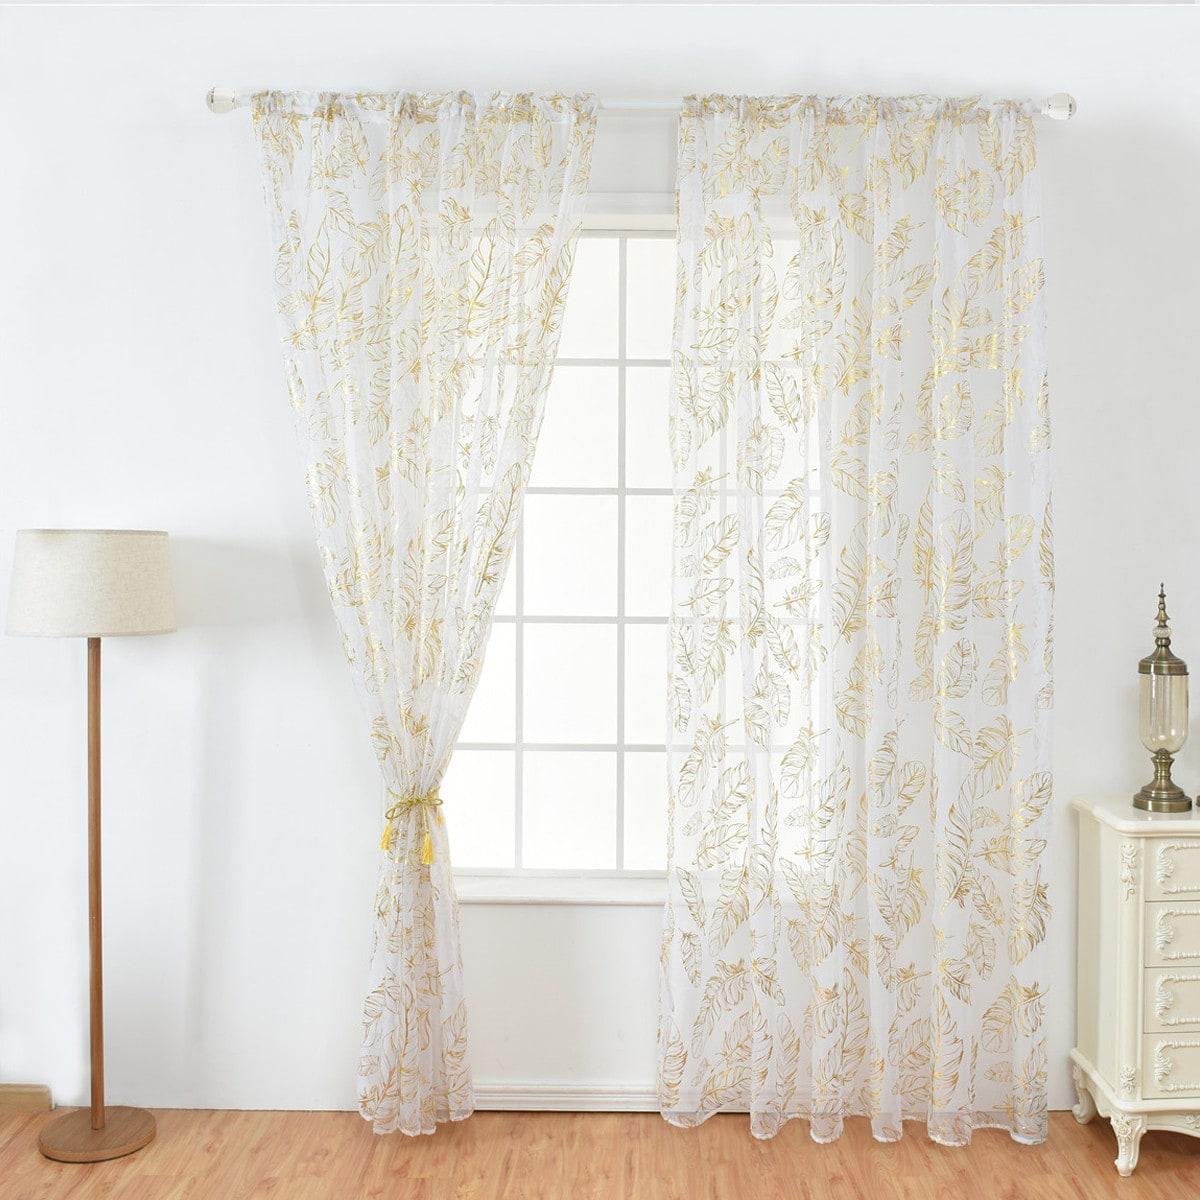 Feather Bronzing Rod Pocket Sheer Mesh Curtain 1pc